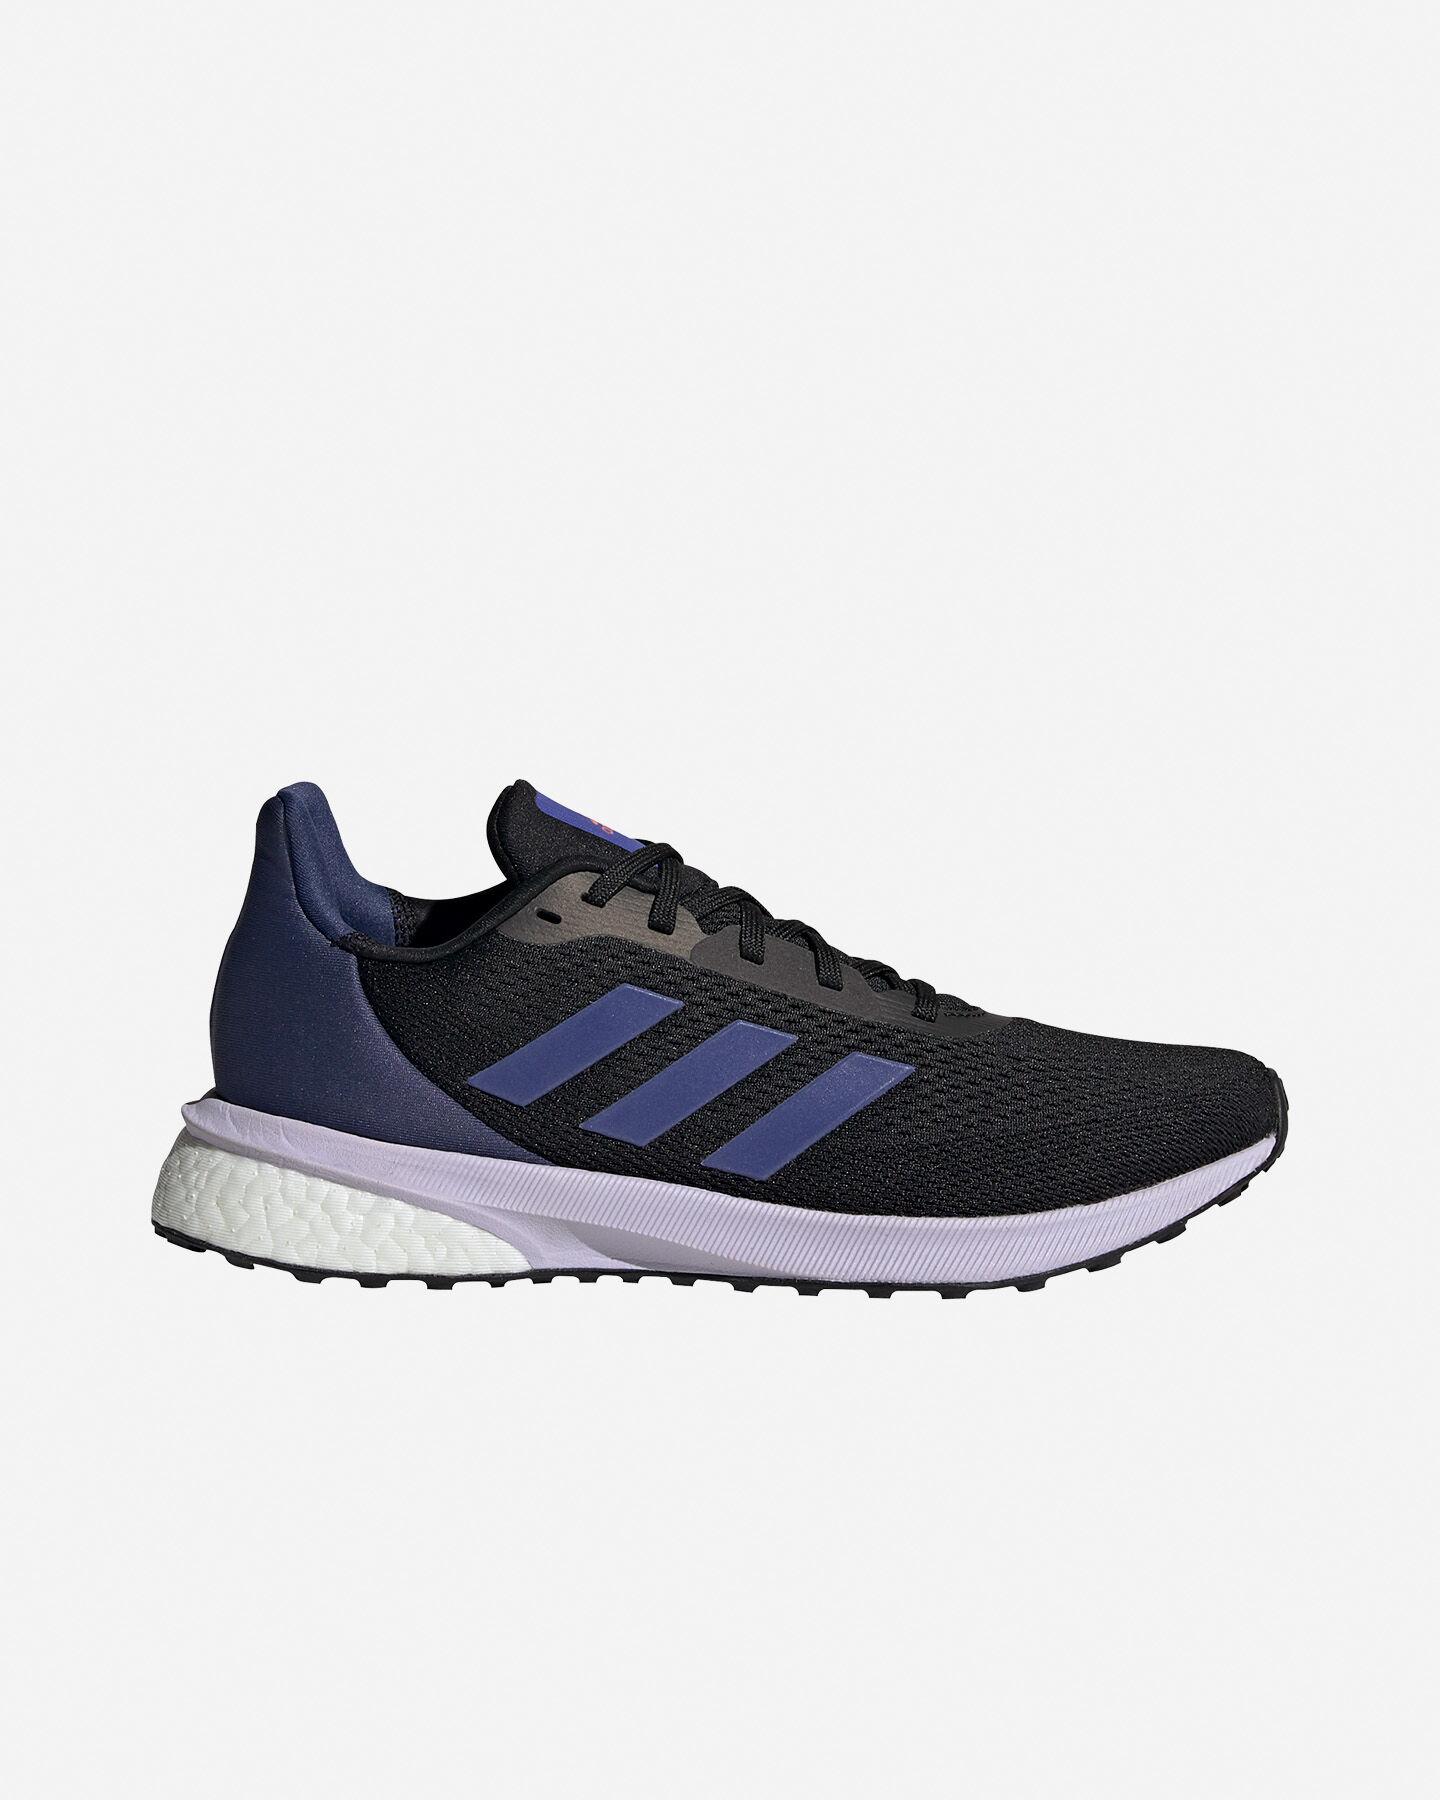 adidas astrarun w scarpe running donna